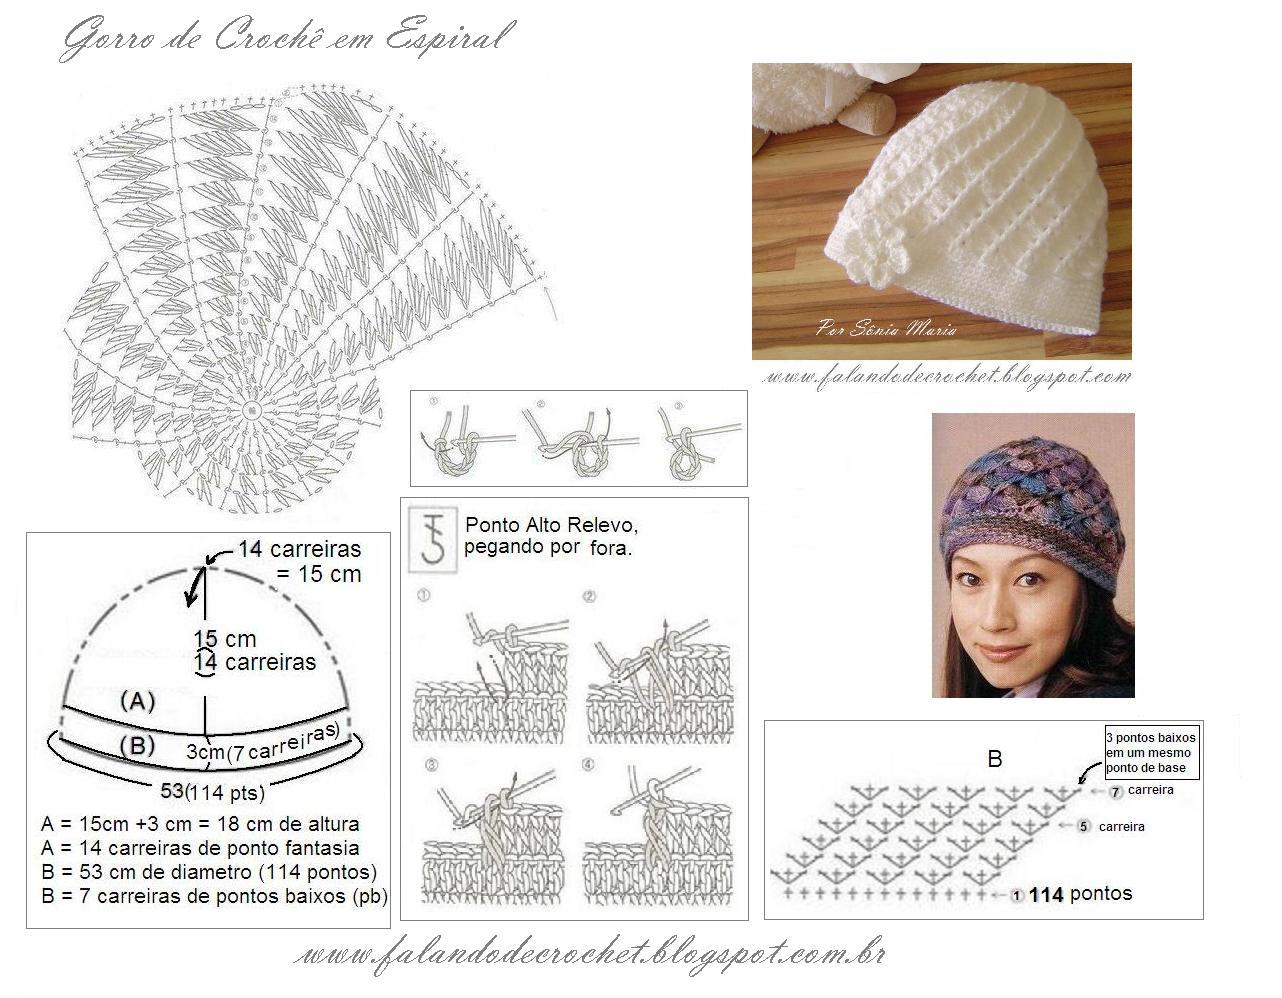 1a13f8cfdec27 FALANDO DE CROCHET  Gorro Divino (Divine Hat) - Croche - Crochet ...